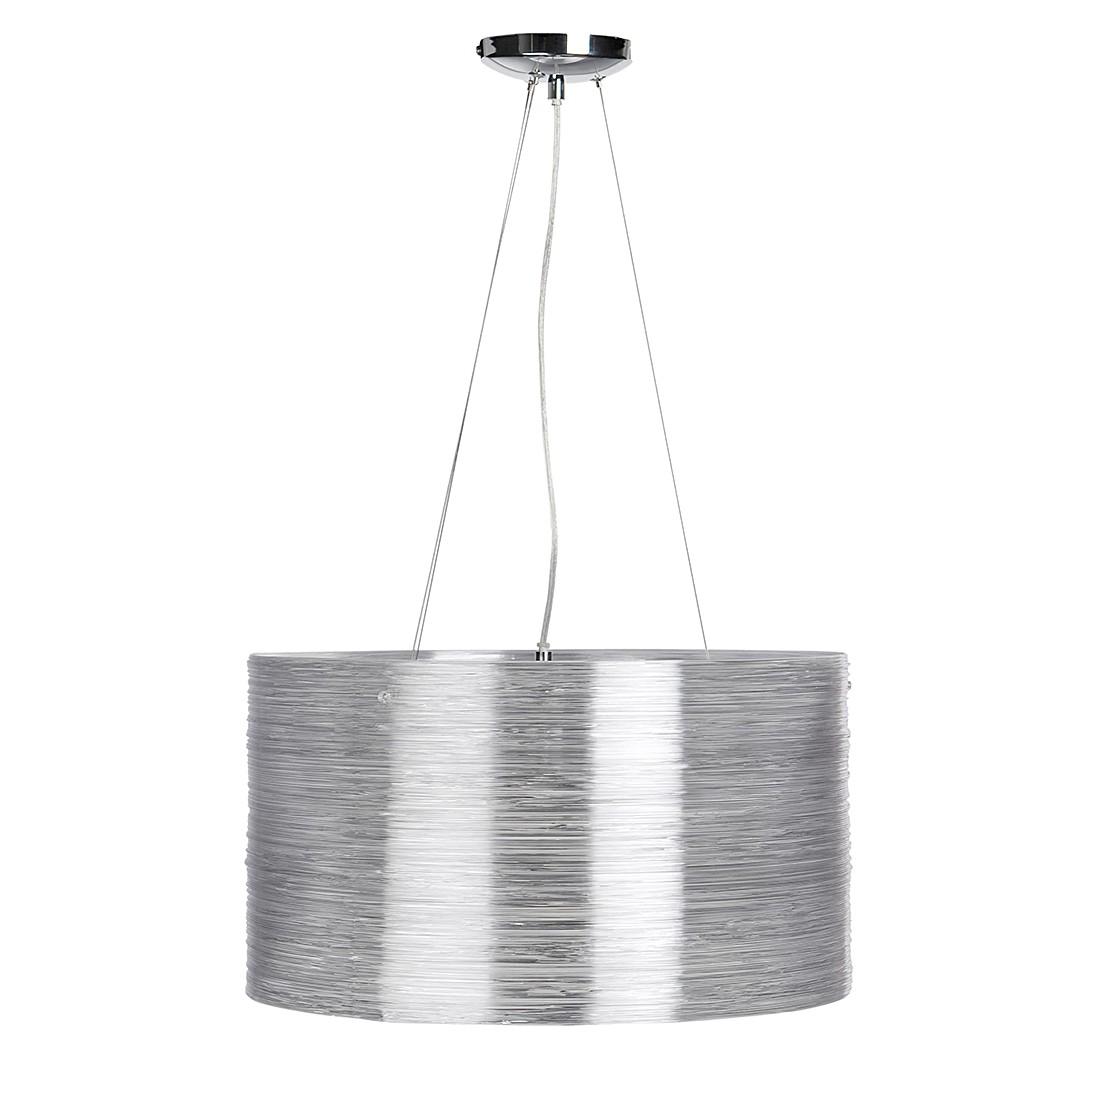 EEK A++, Pendelleuchte Bright - Silber - 3-flammig, Sompex